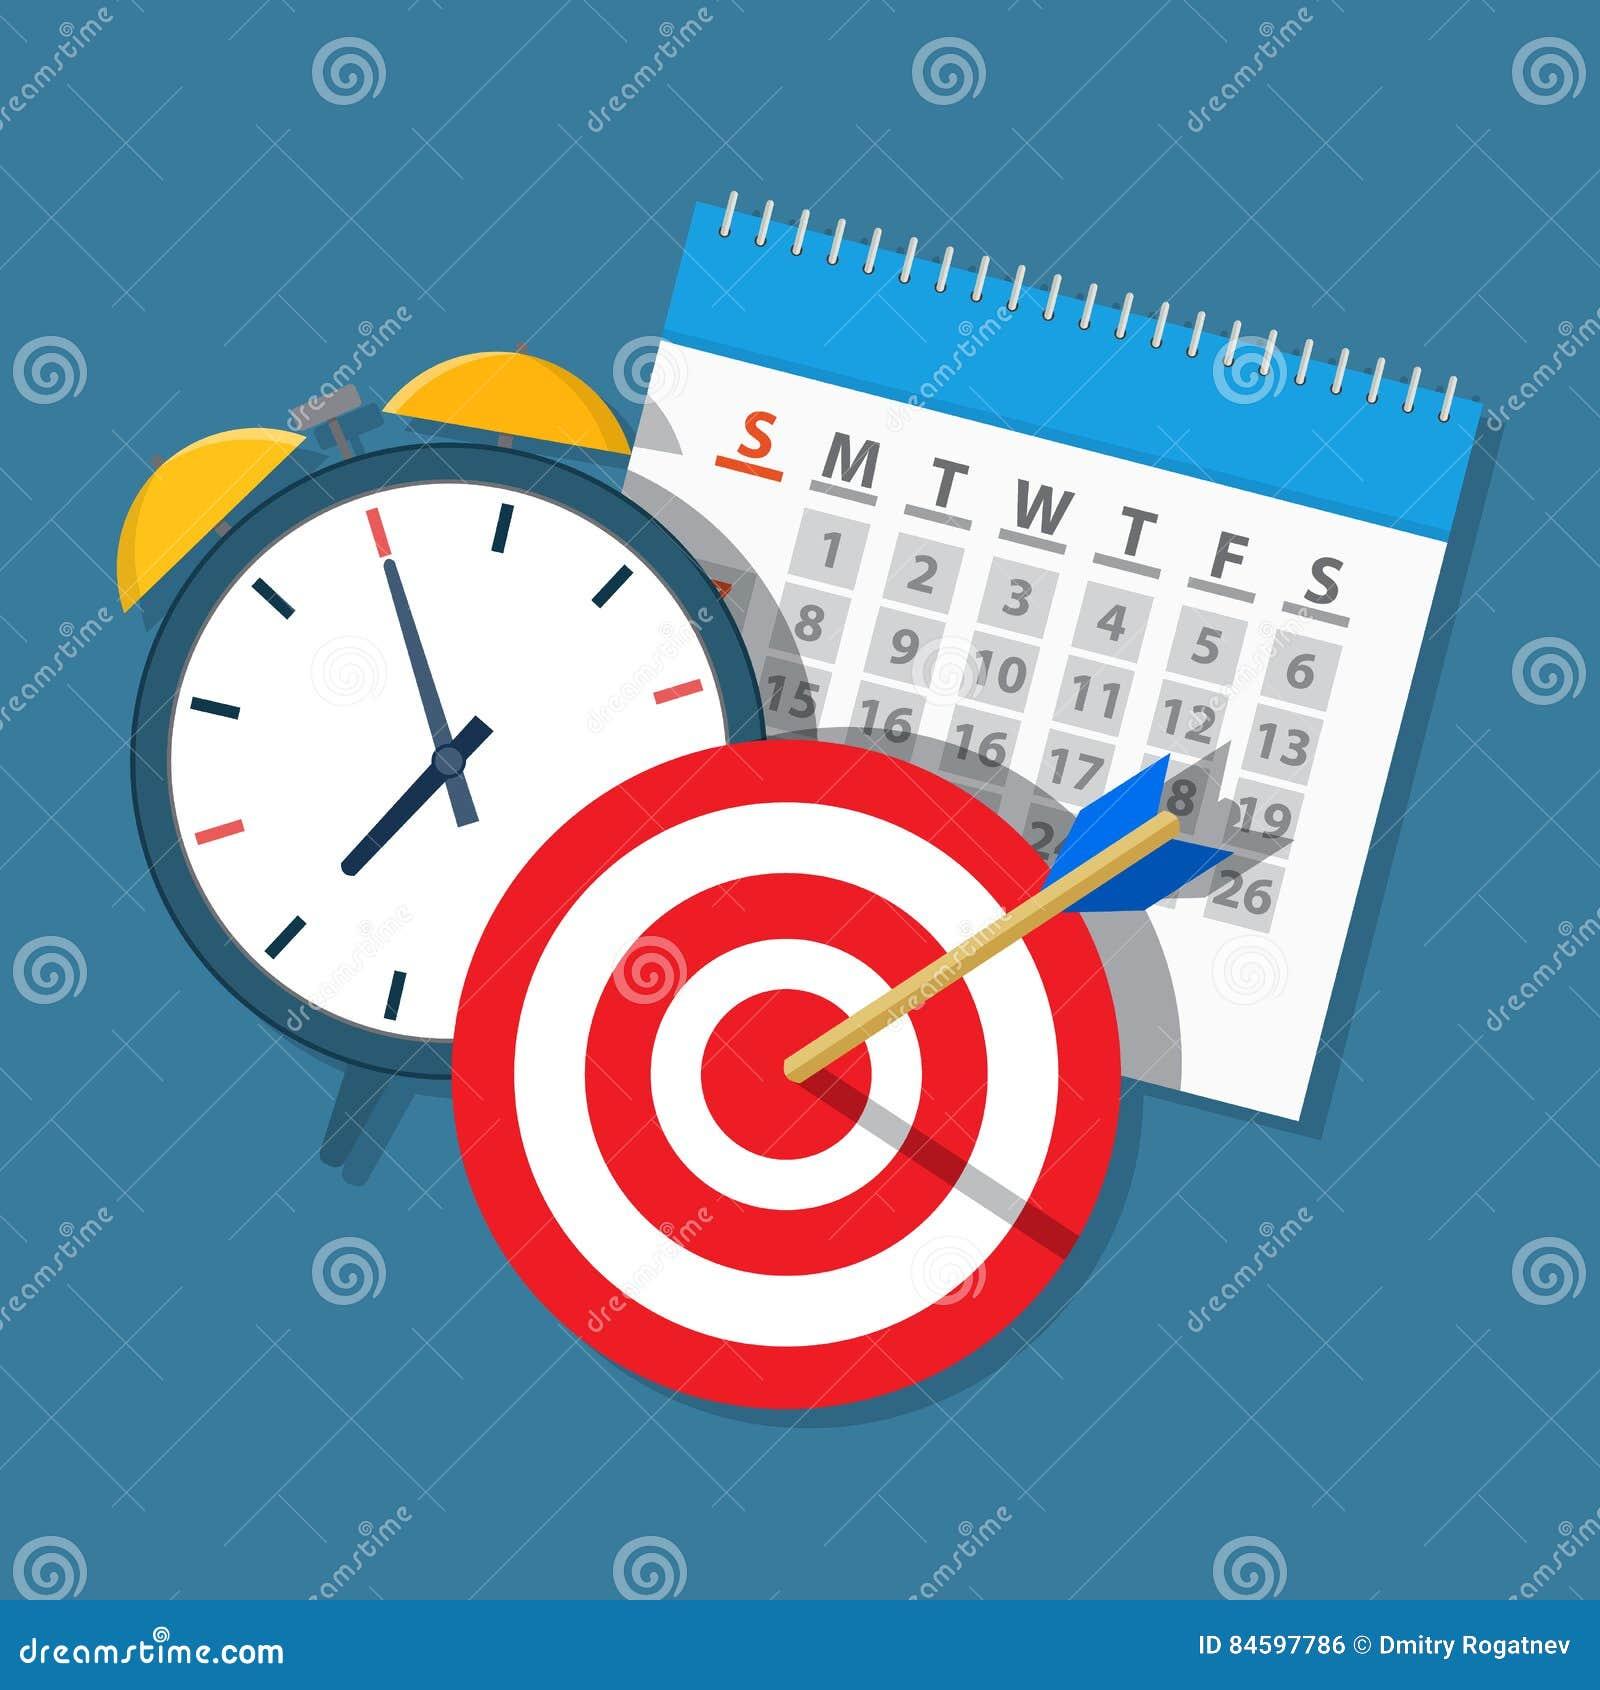 Calendar Planner Target : Alarm clock calendar target. stock vector illustration of